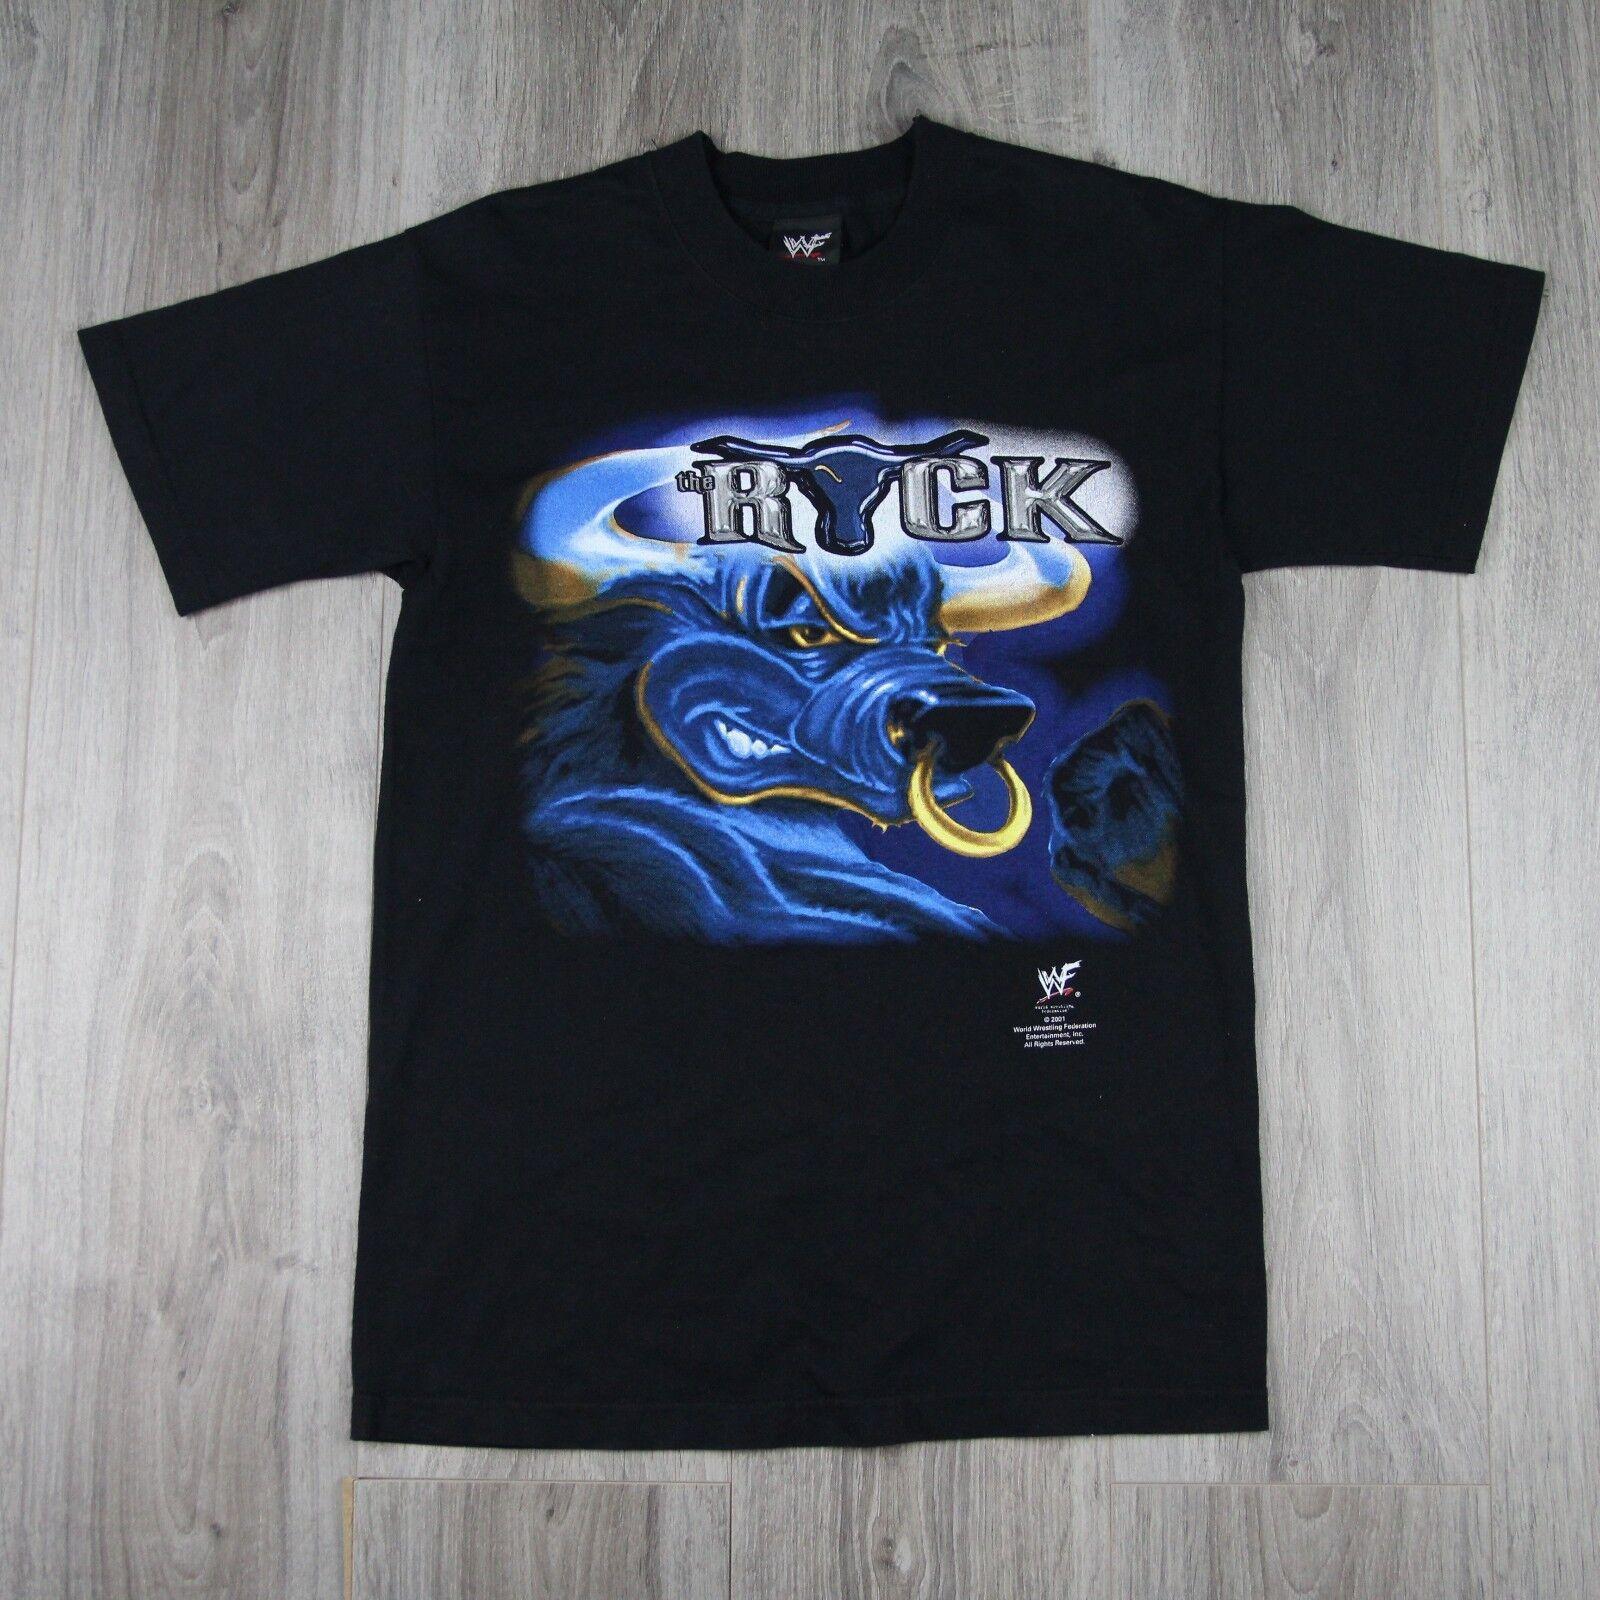 Herren Oldtimer Wwf 2001 The Rock Wrestling T-Shirt Brahma Bulle Can You Geruch